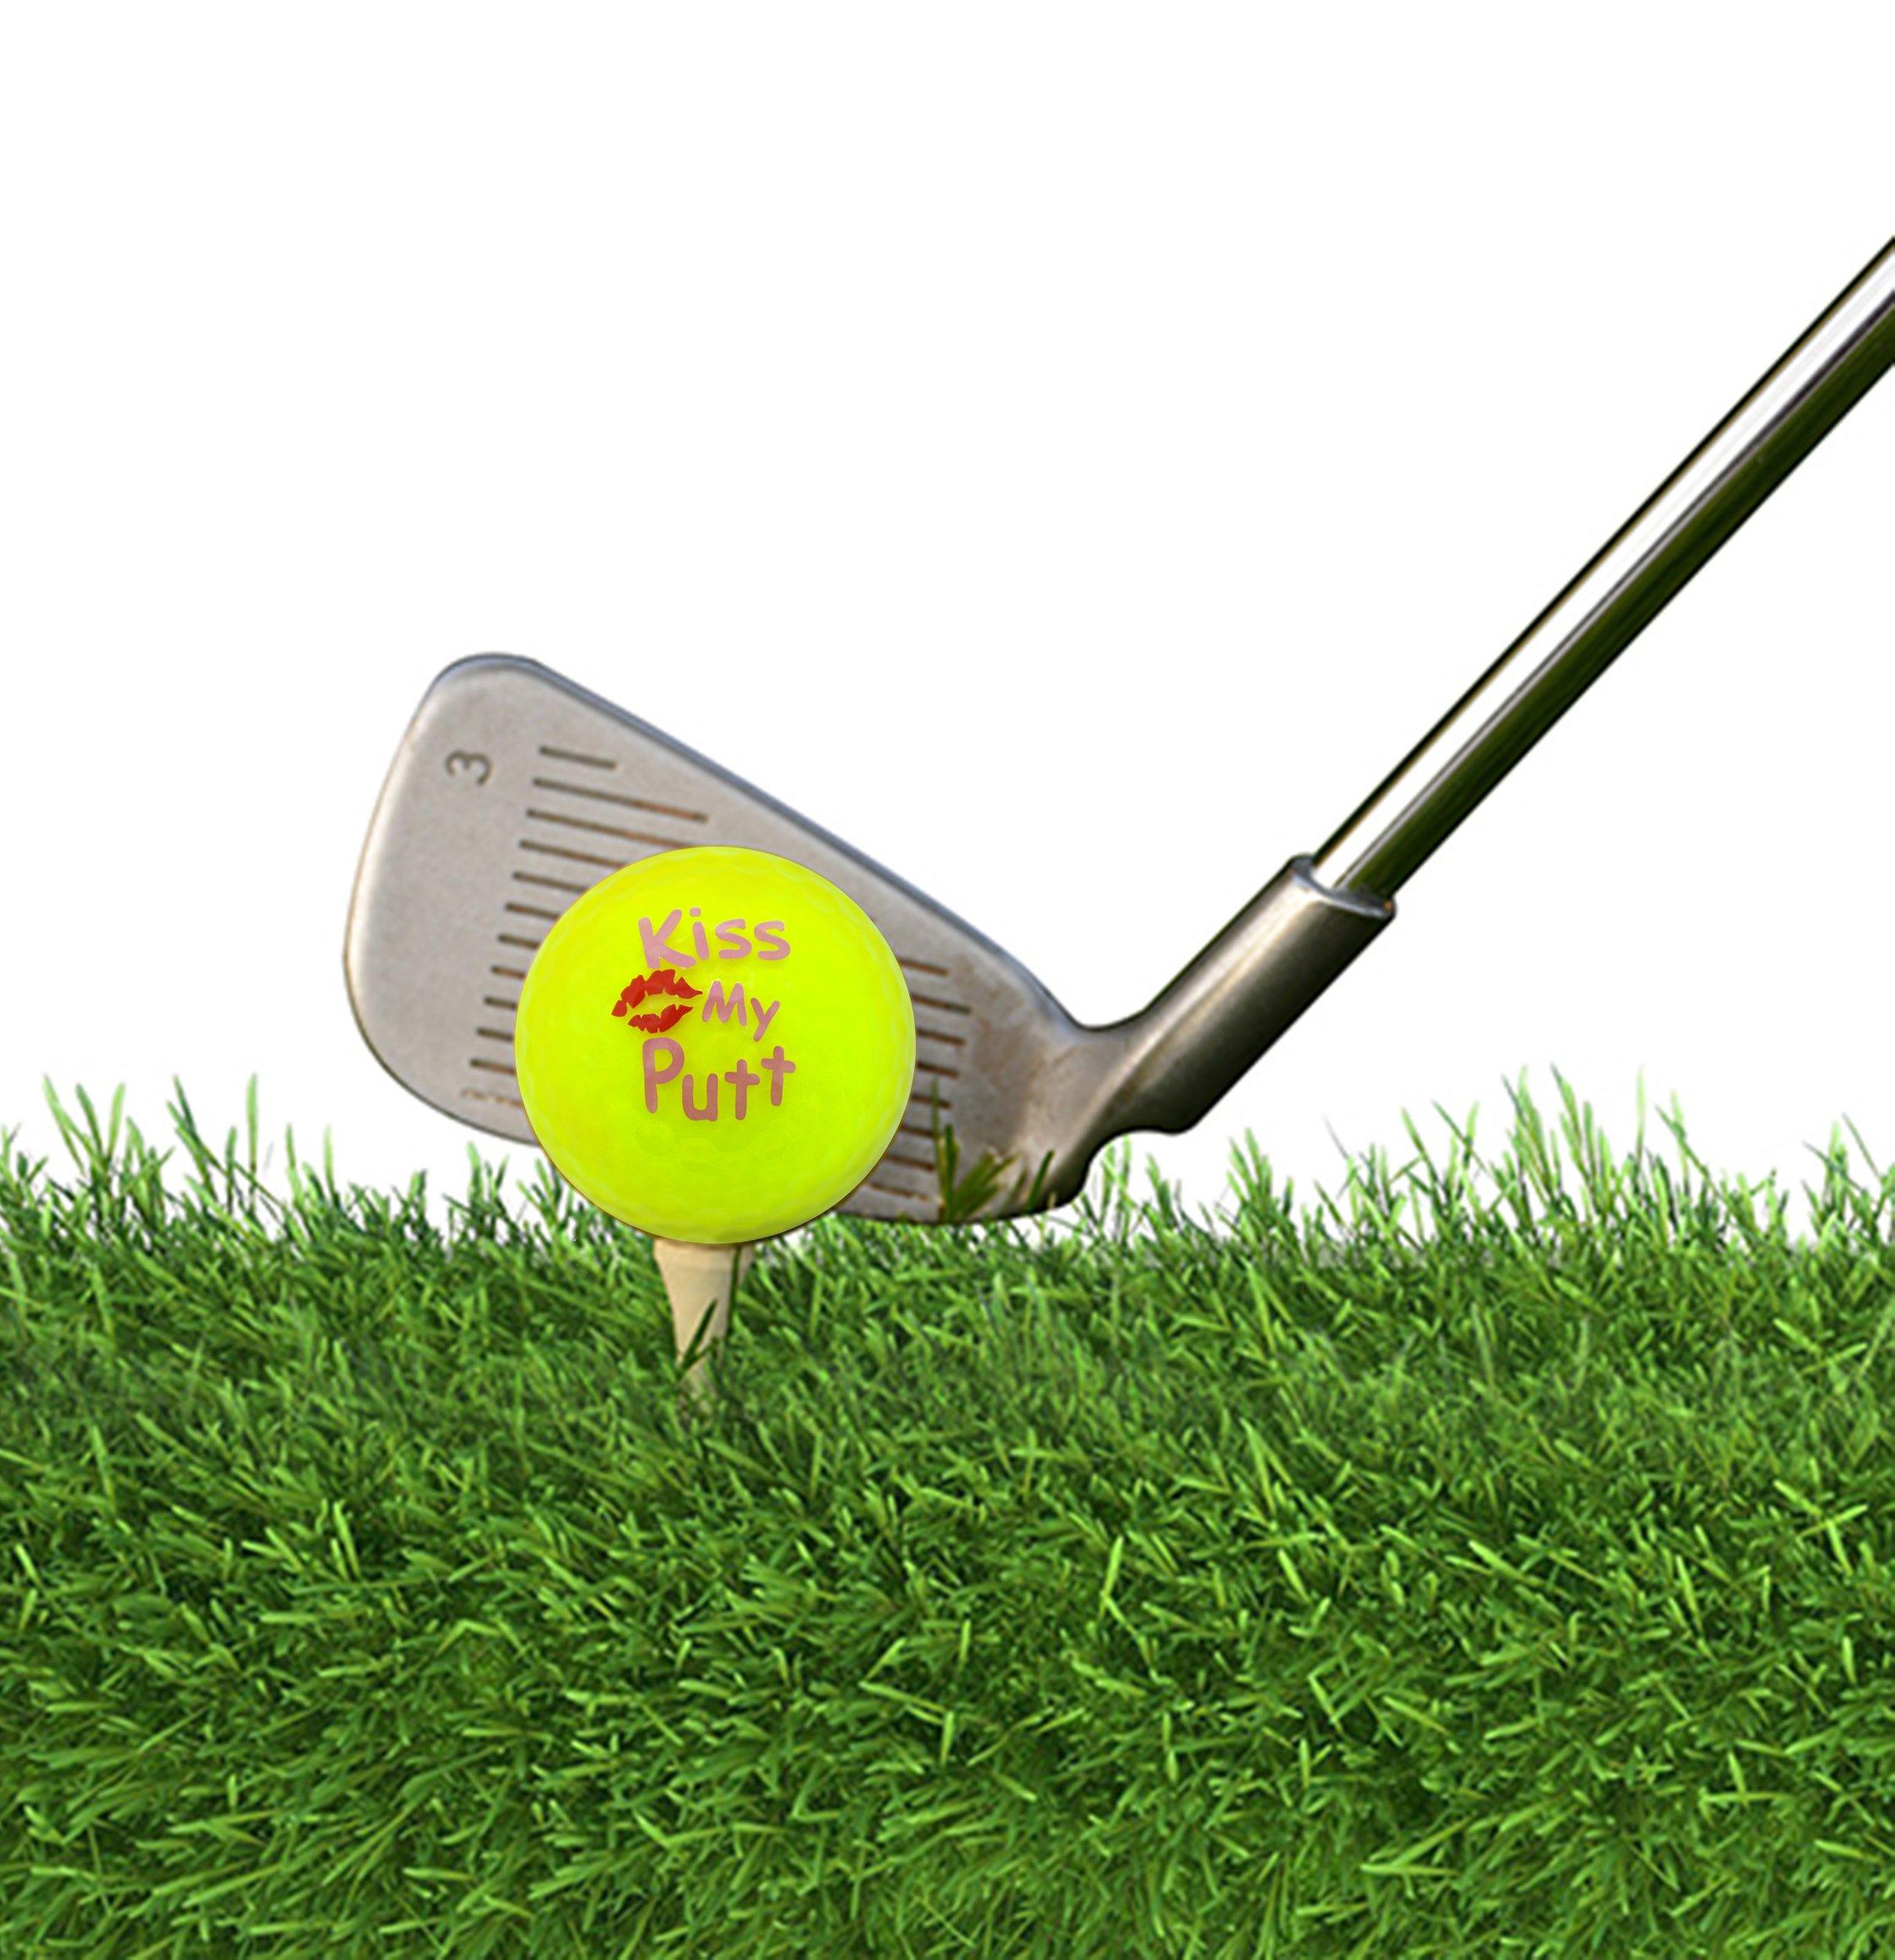 Navika Golf Balls- Kiss My Putt Imprint on Neon Yellow High Visibility Color (3-Pack)